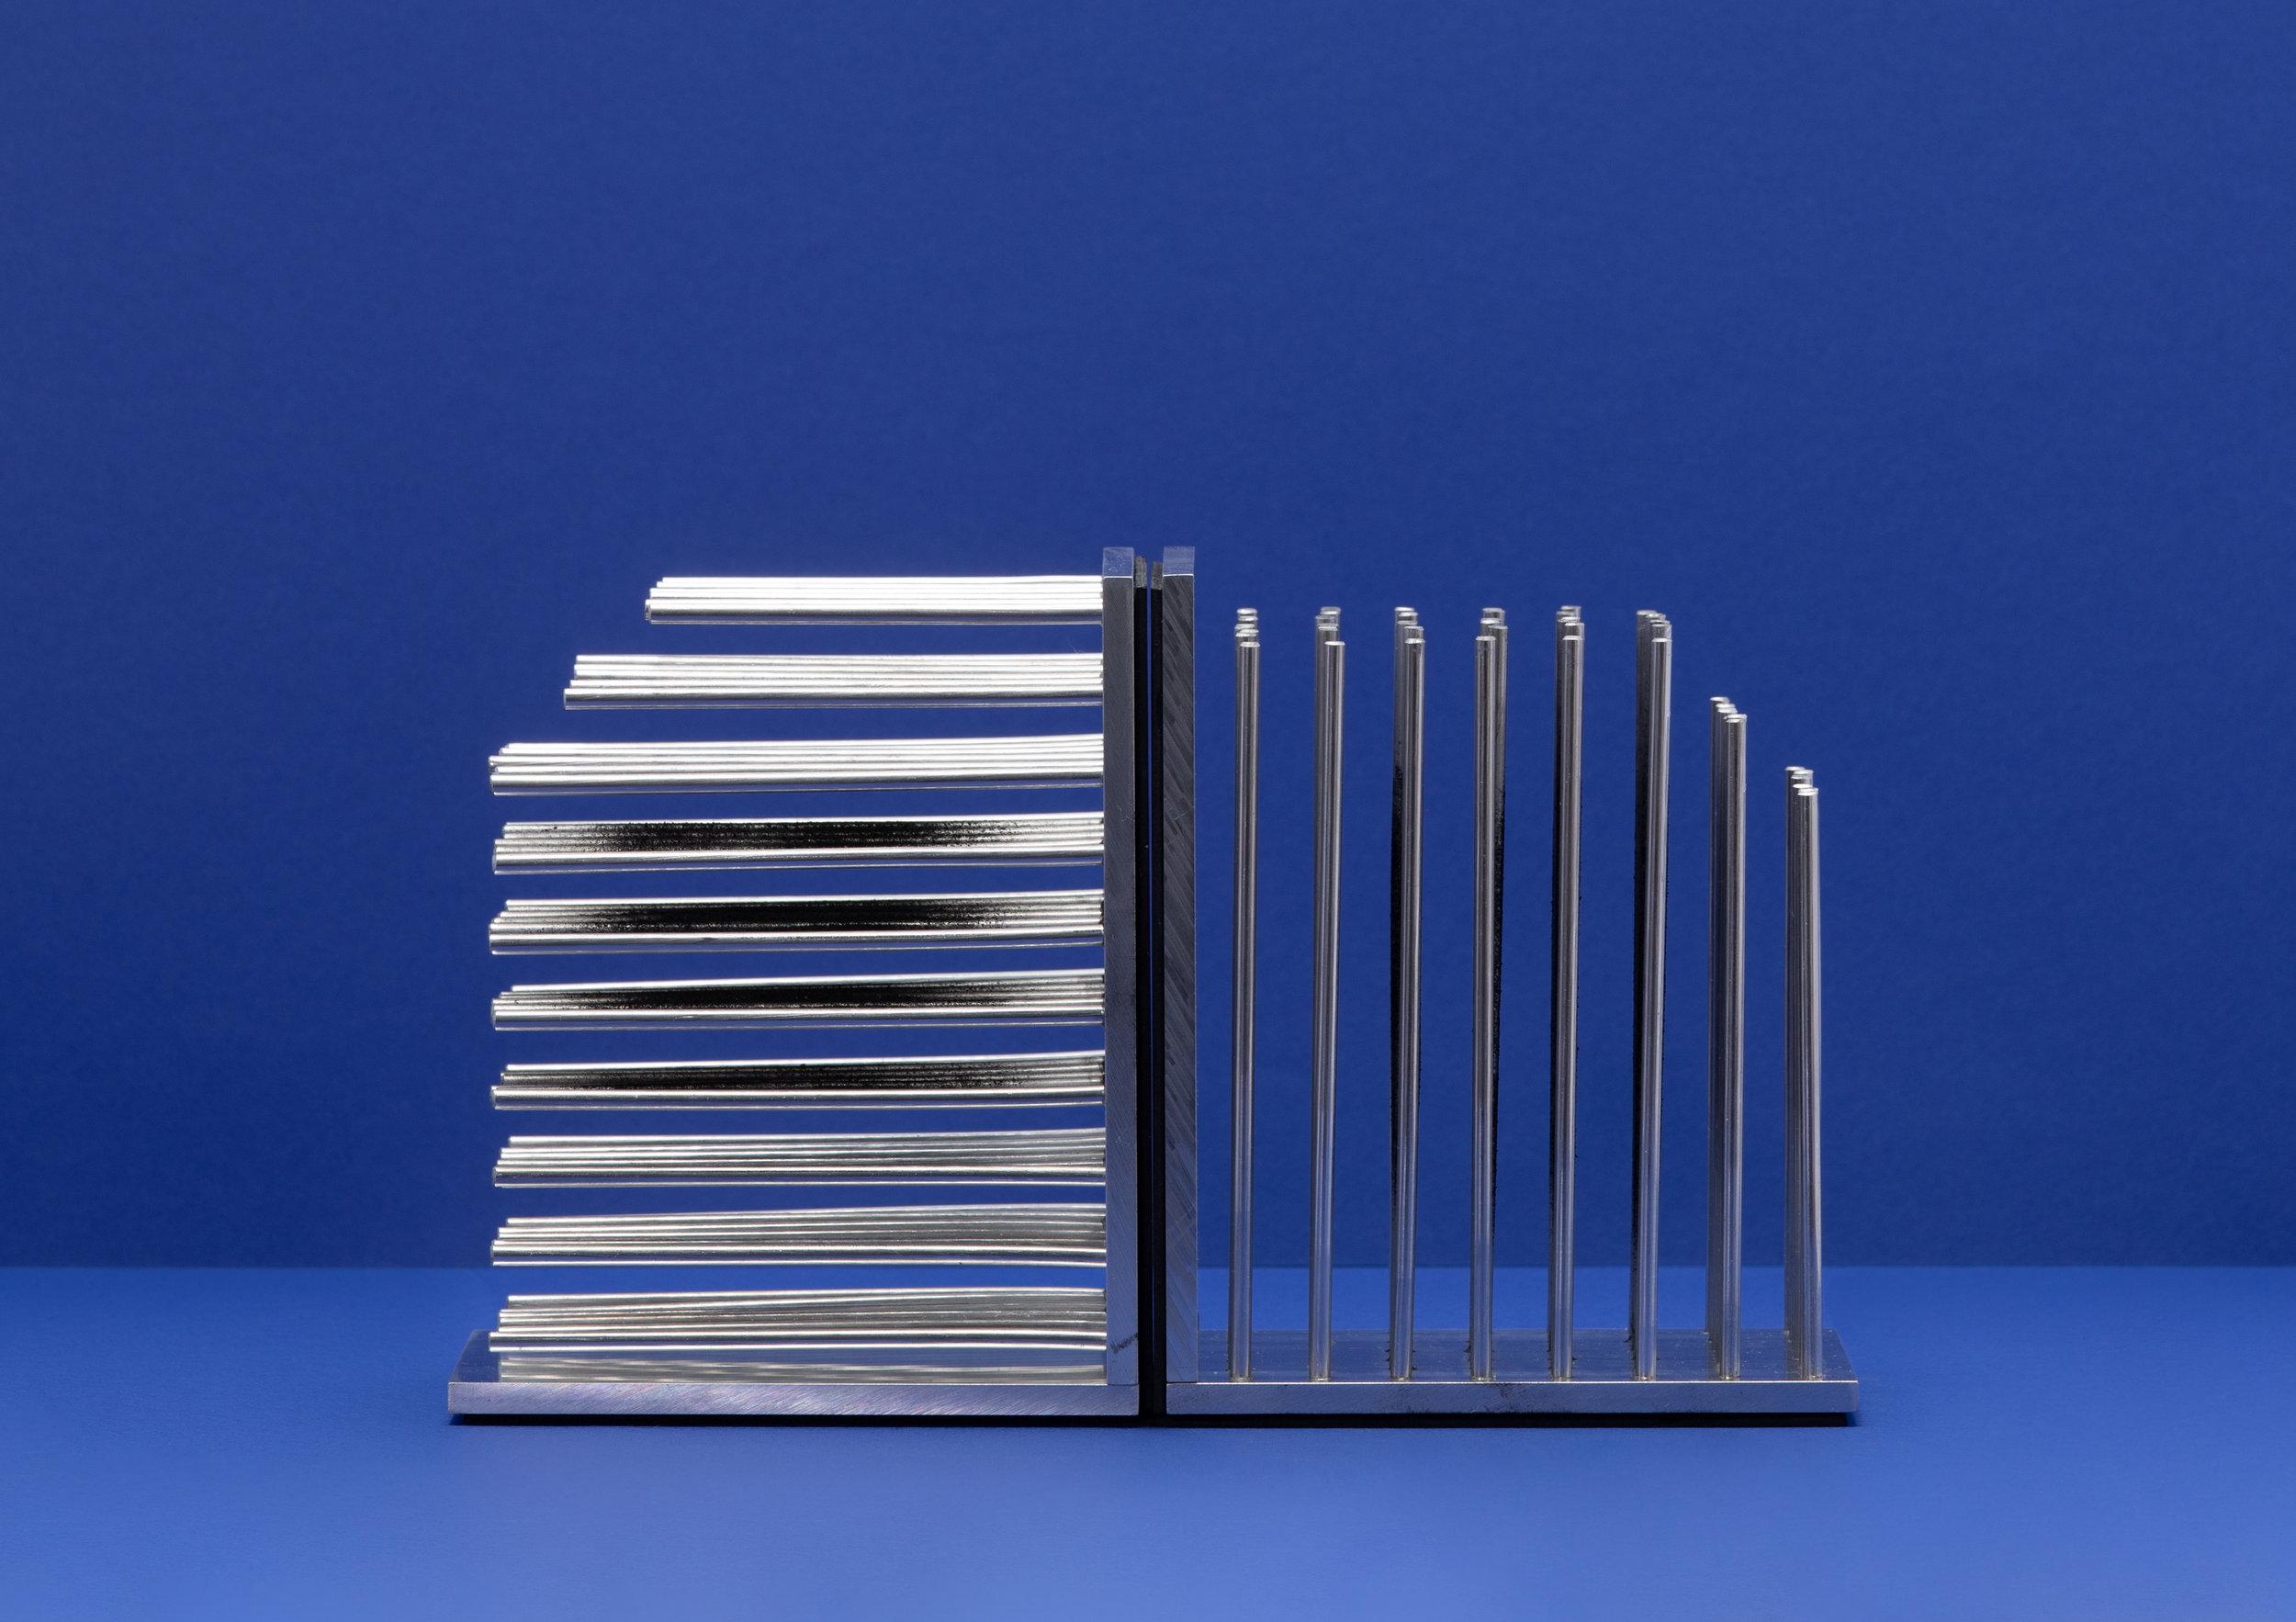 Ma-tt-er_Why Materials Matter Bookends_Tino Seubert_Photography credits Dilesh Solanki 002.jpg